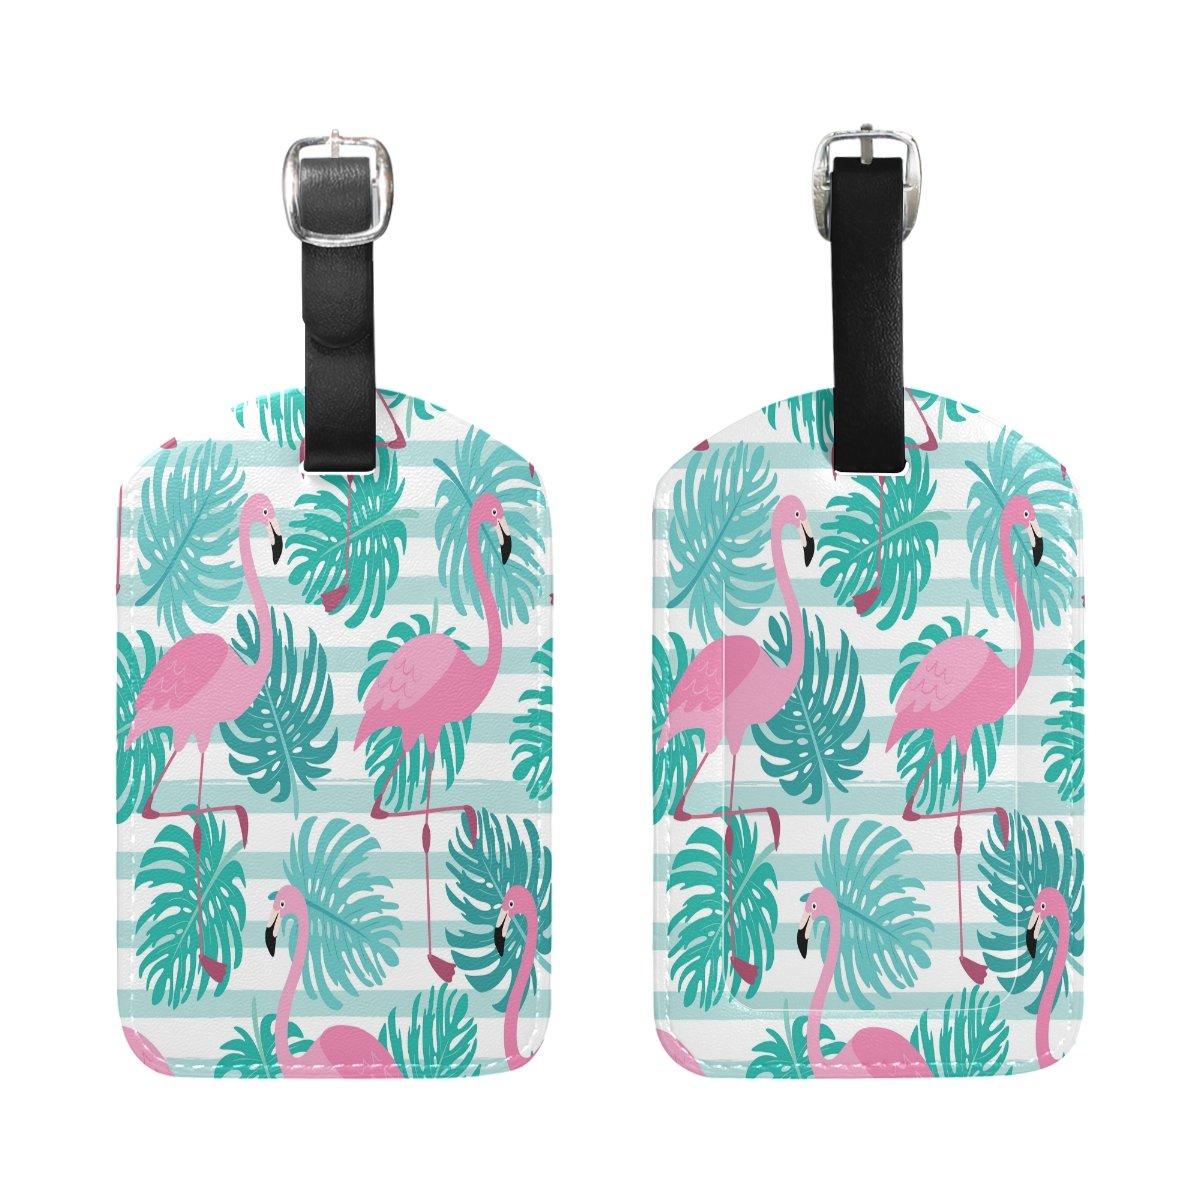 Saobao Travel Luggage Tag Flamingos PU Leather Baggage Suitcase Travel ID Bag Tag 1Pcs